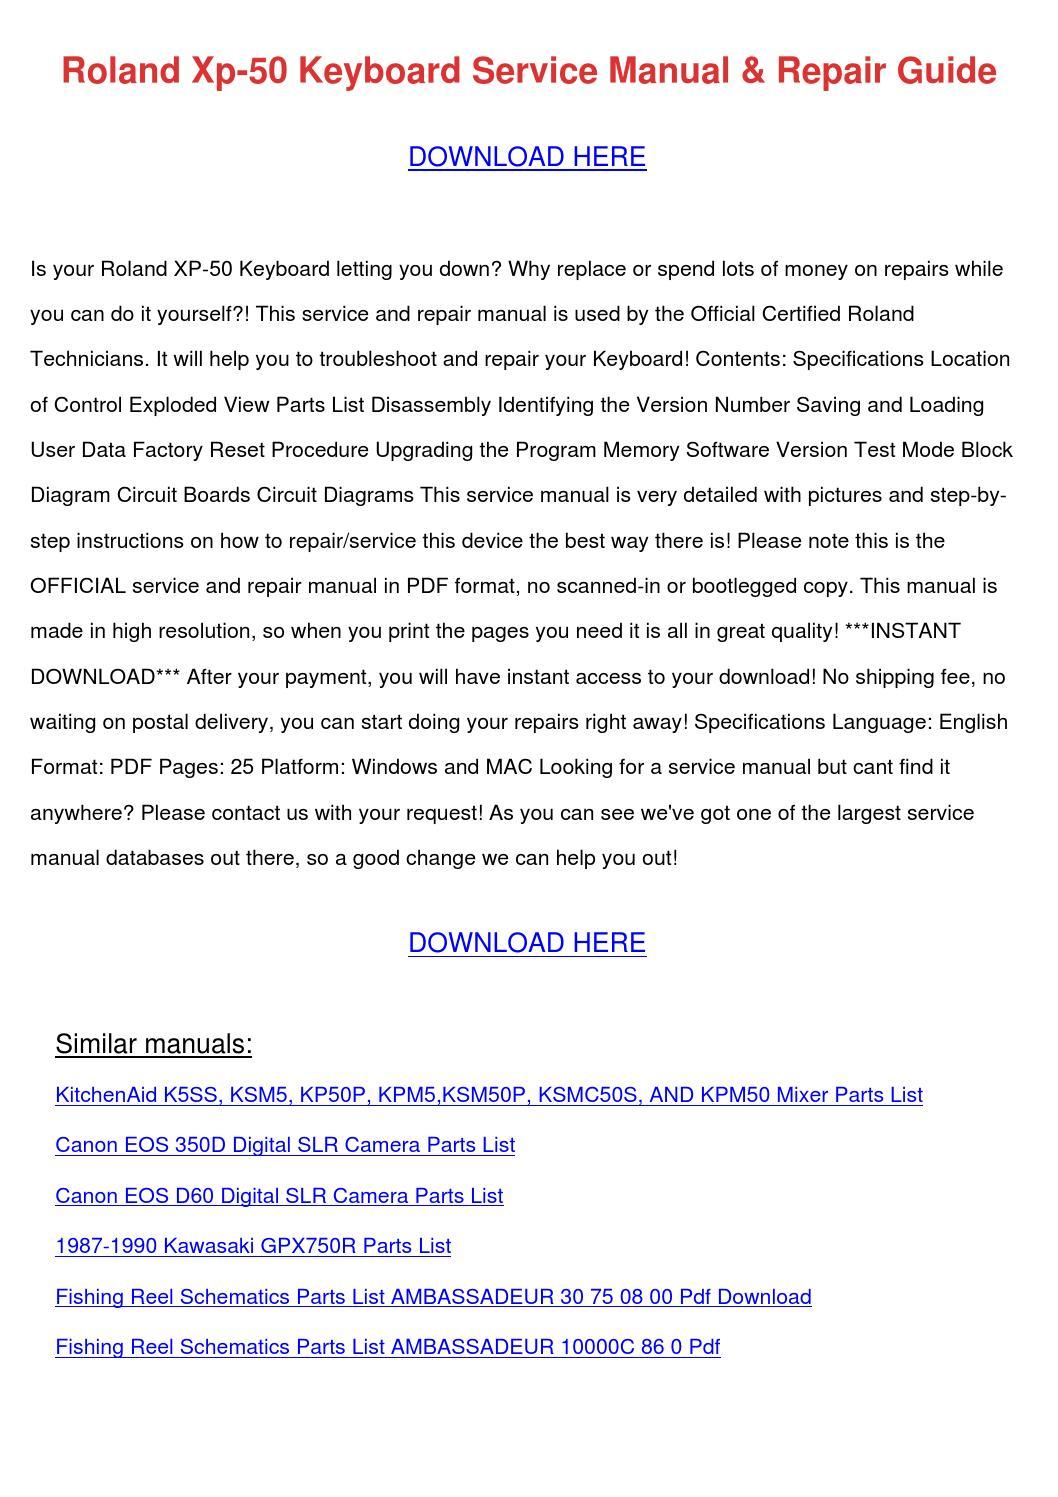 Roland Xp 50 Keyboard Service Manual Repair G by CerysBriley ...